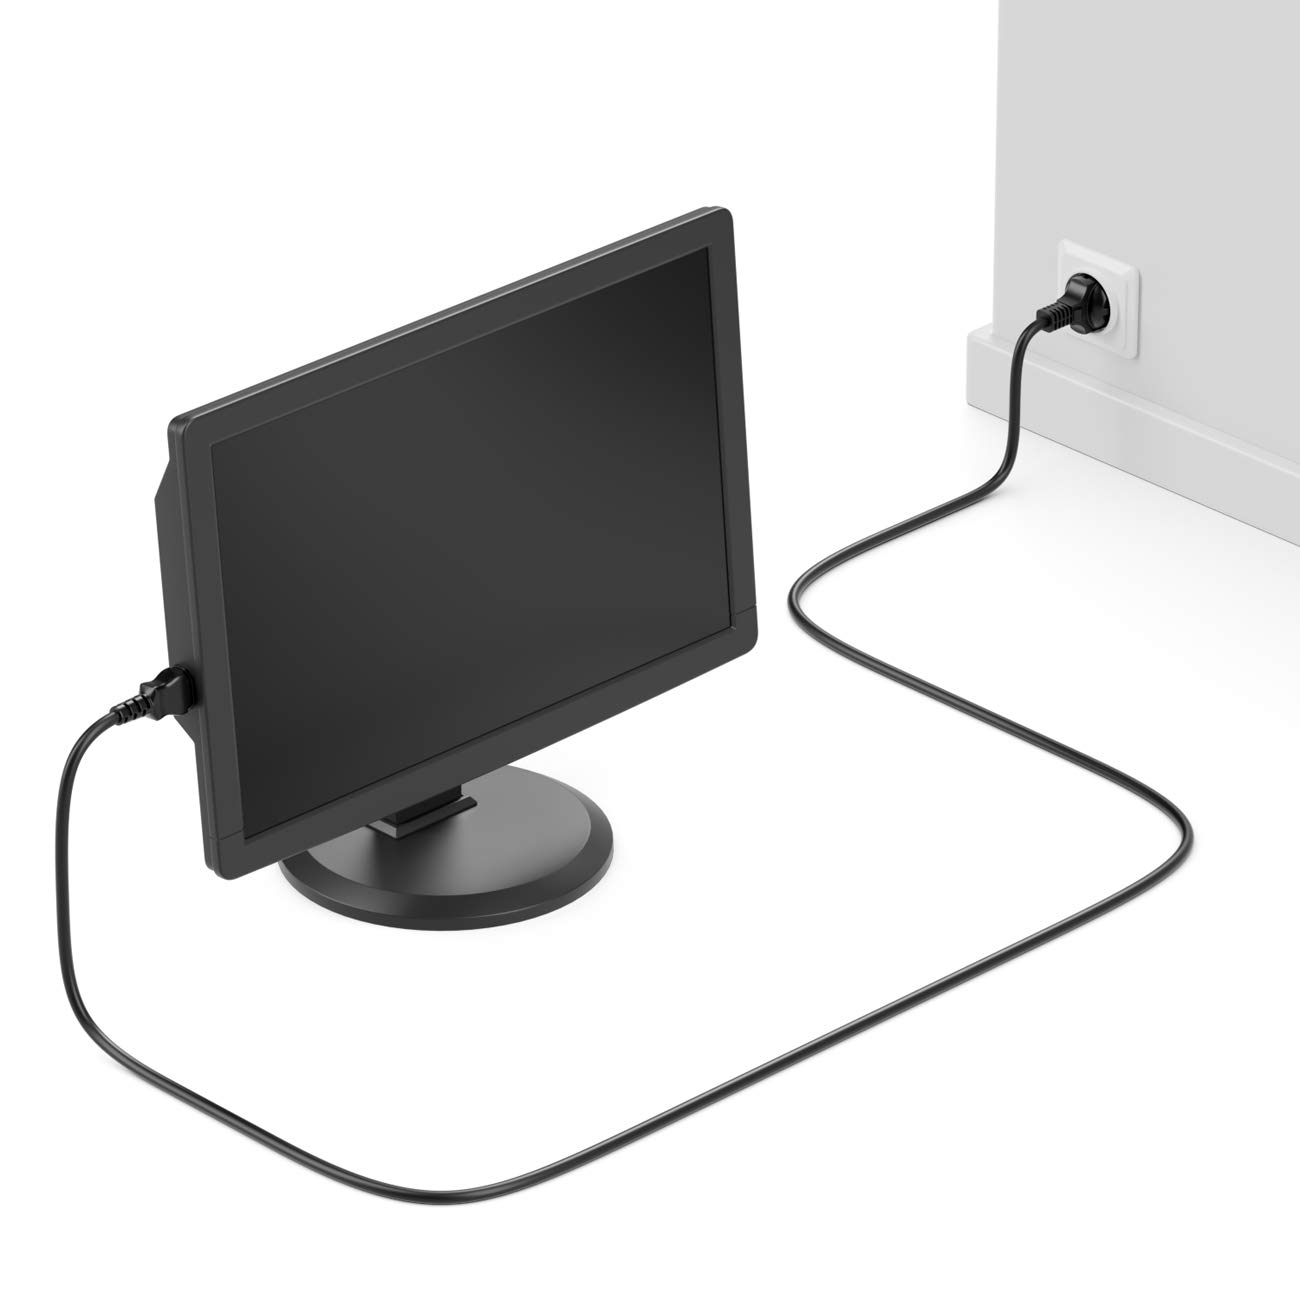 CEE 7//4 deleyCON 5m Cable de Alimentaci/ón a Prueba de Choques Enchufe Tipo F en Toma de Entrada C13 Enchufe Ordenador Personal Ordenador Monitor Impresora Beamer